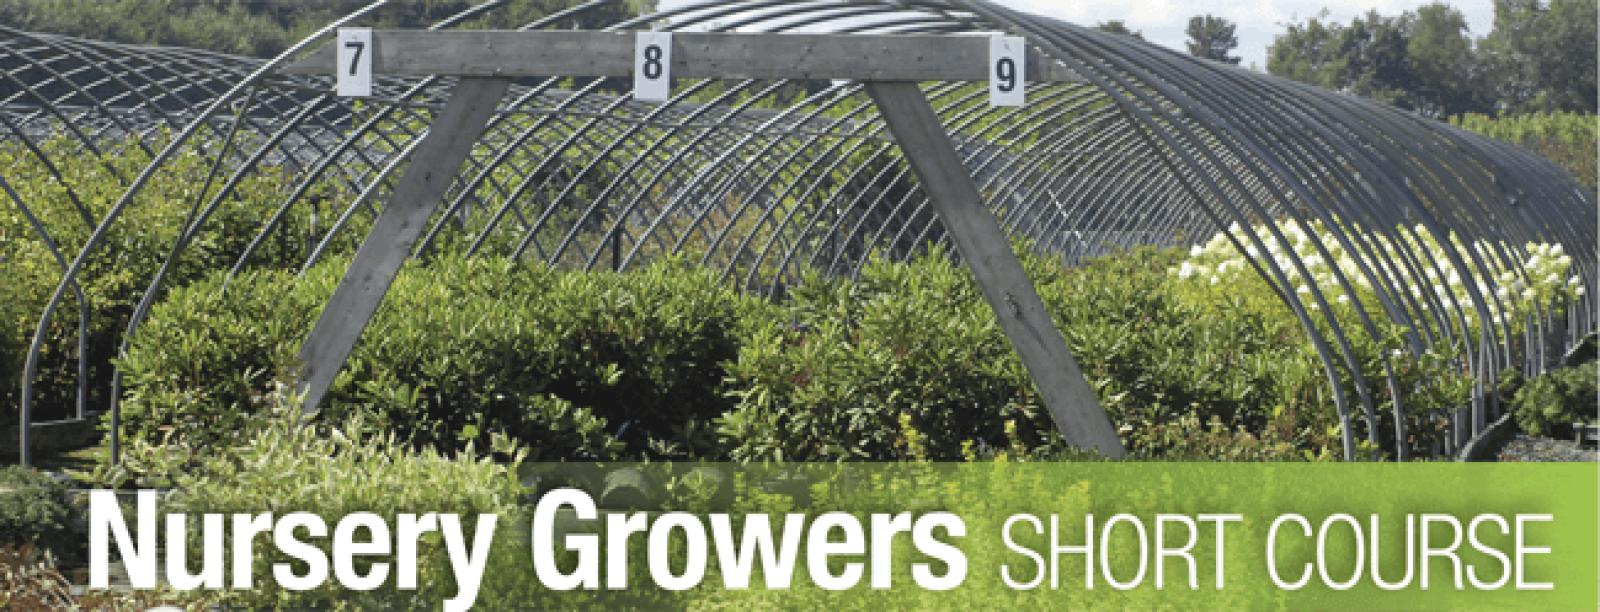 Nursery Growers Short Course